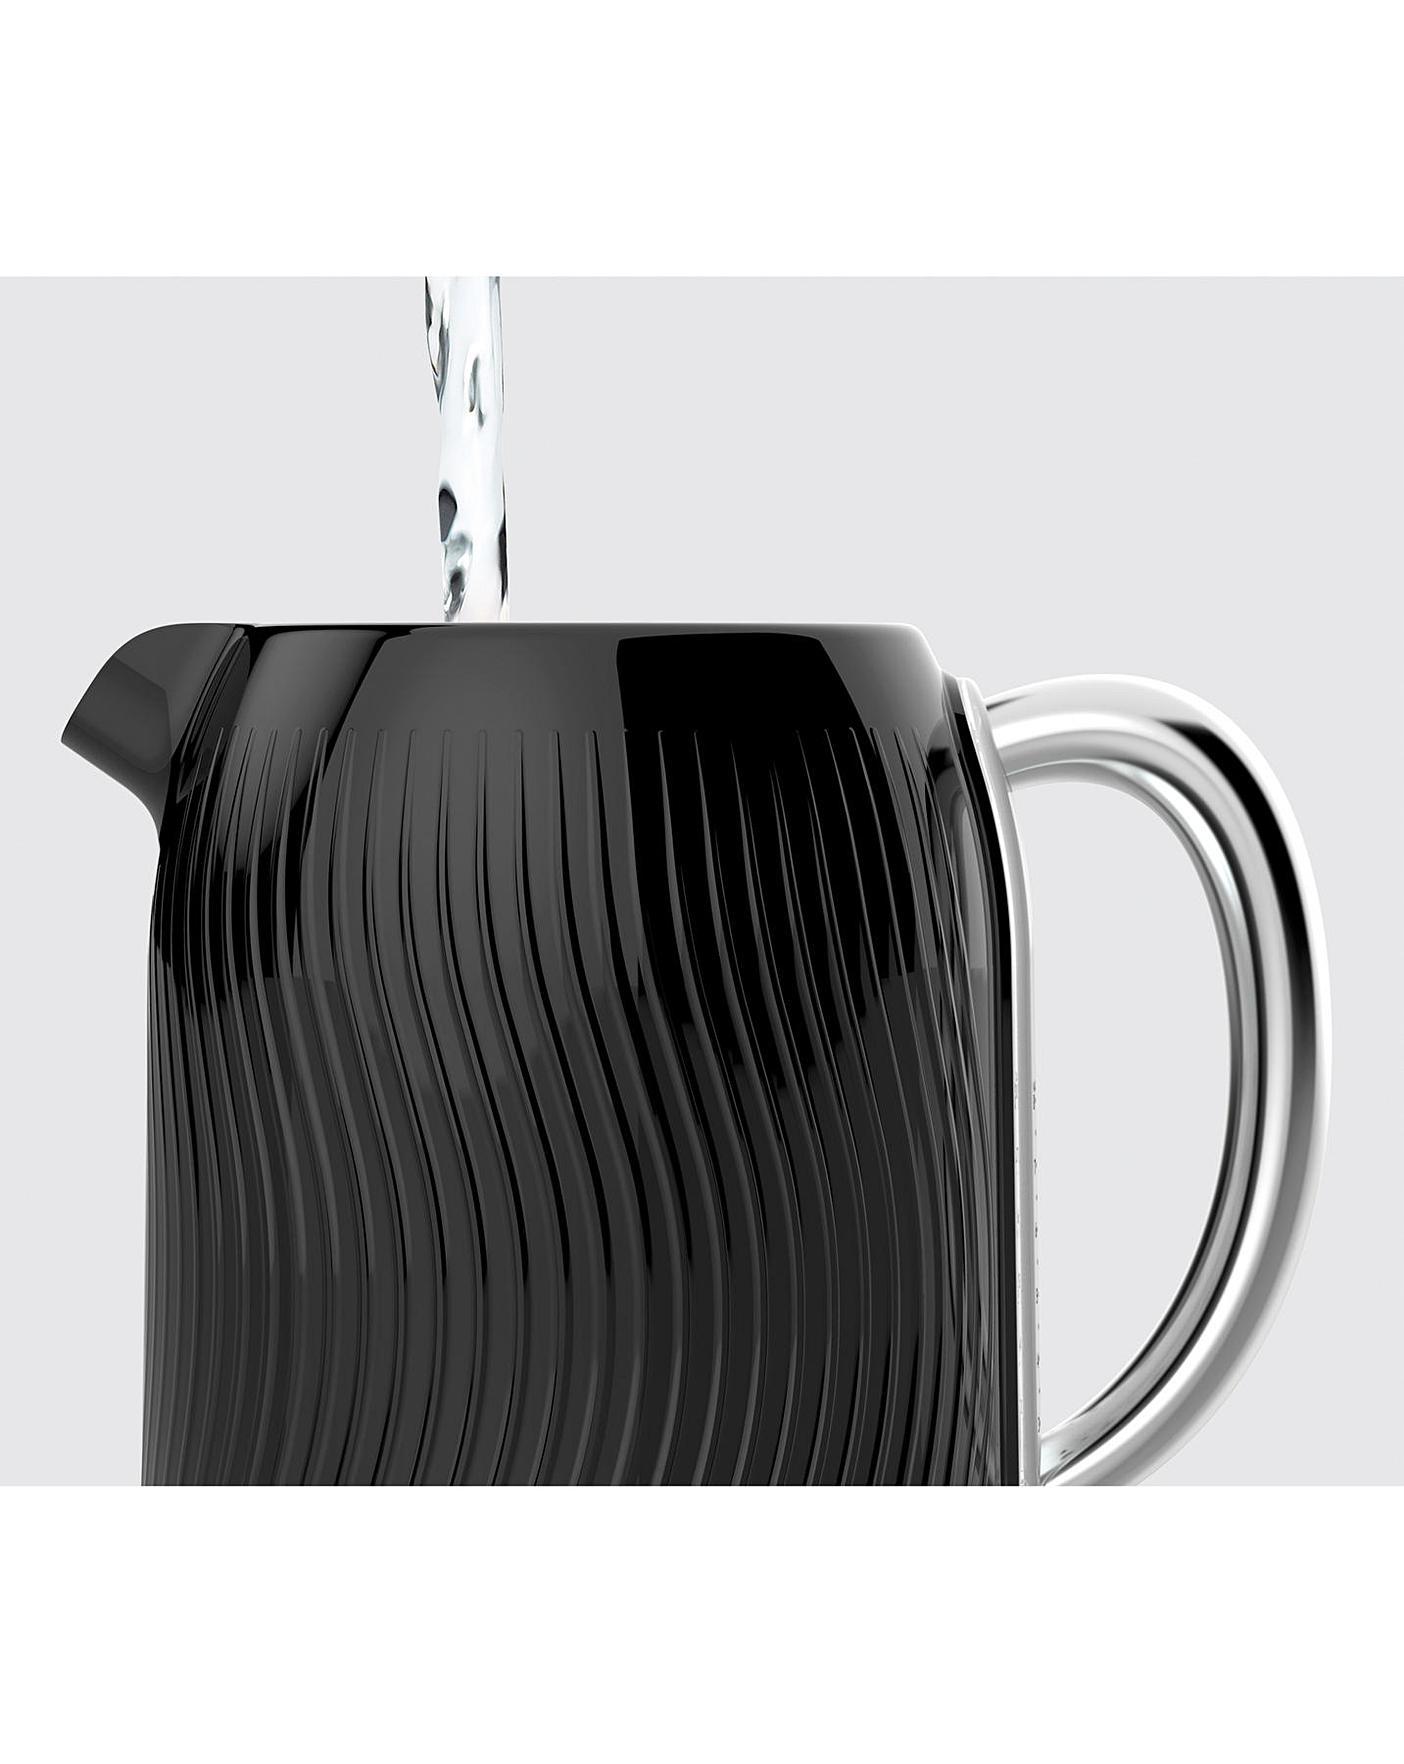 Breville Flow Black Kettle | Ambrose Wilson